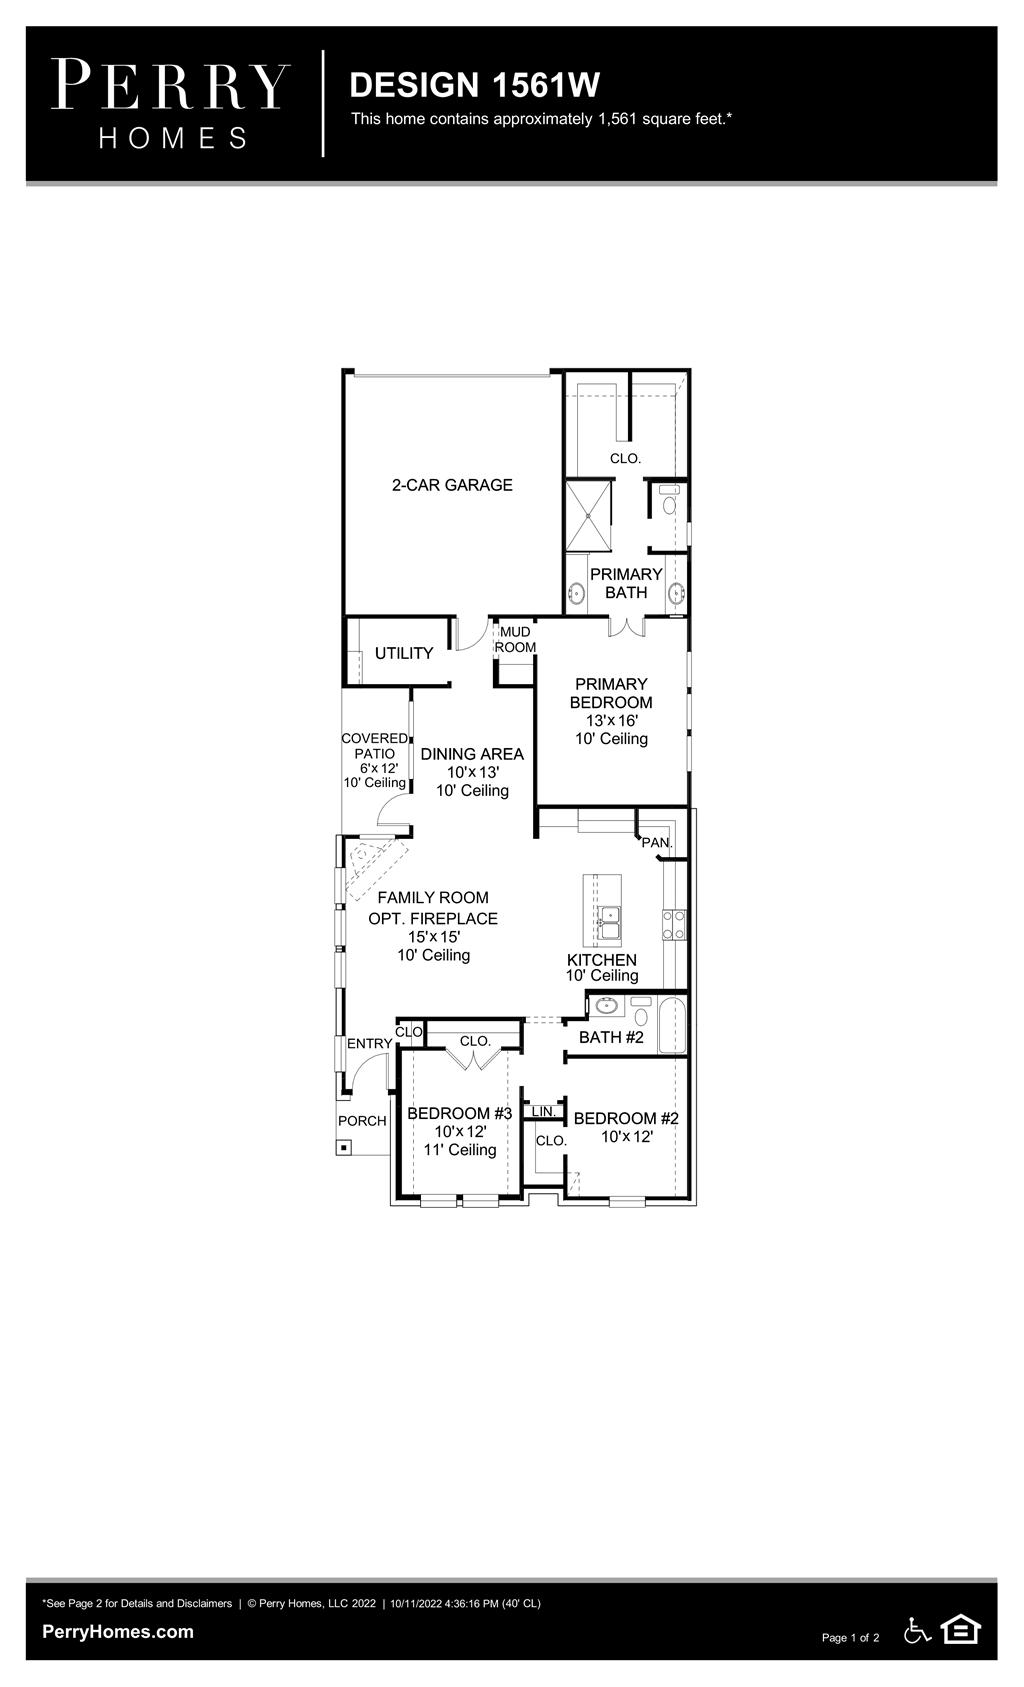 Floor Plan for 1561W